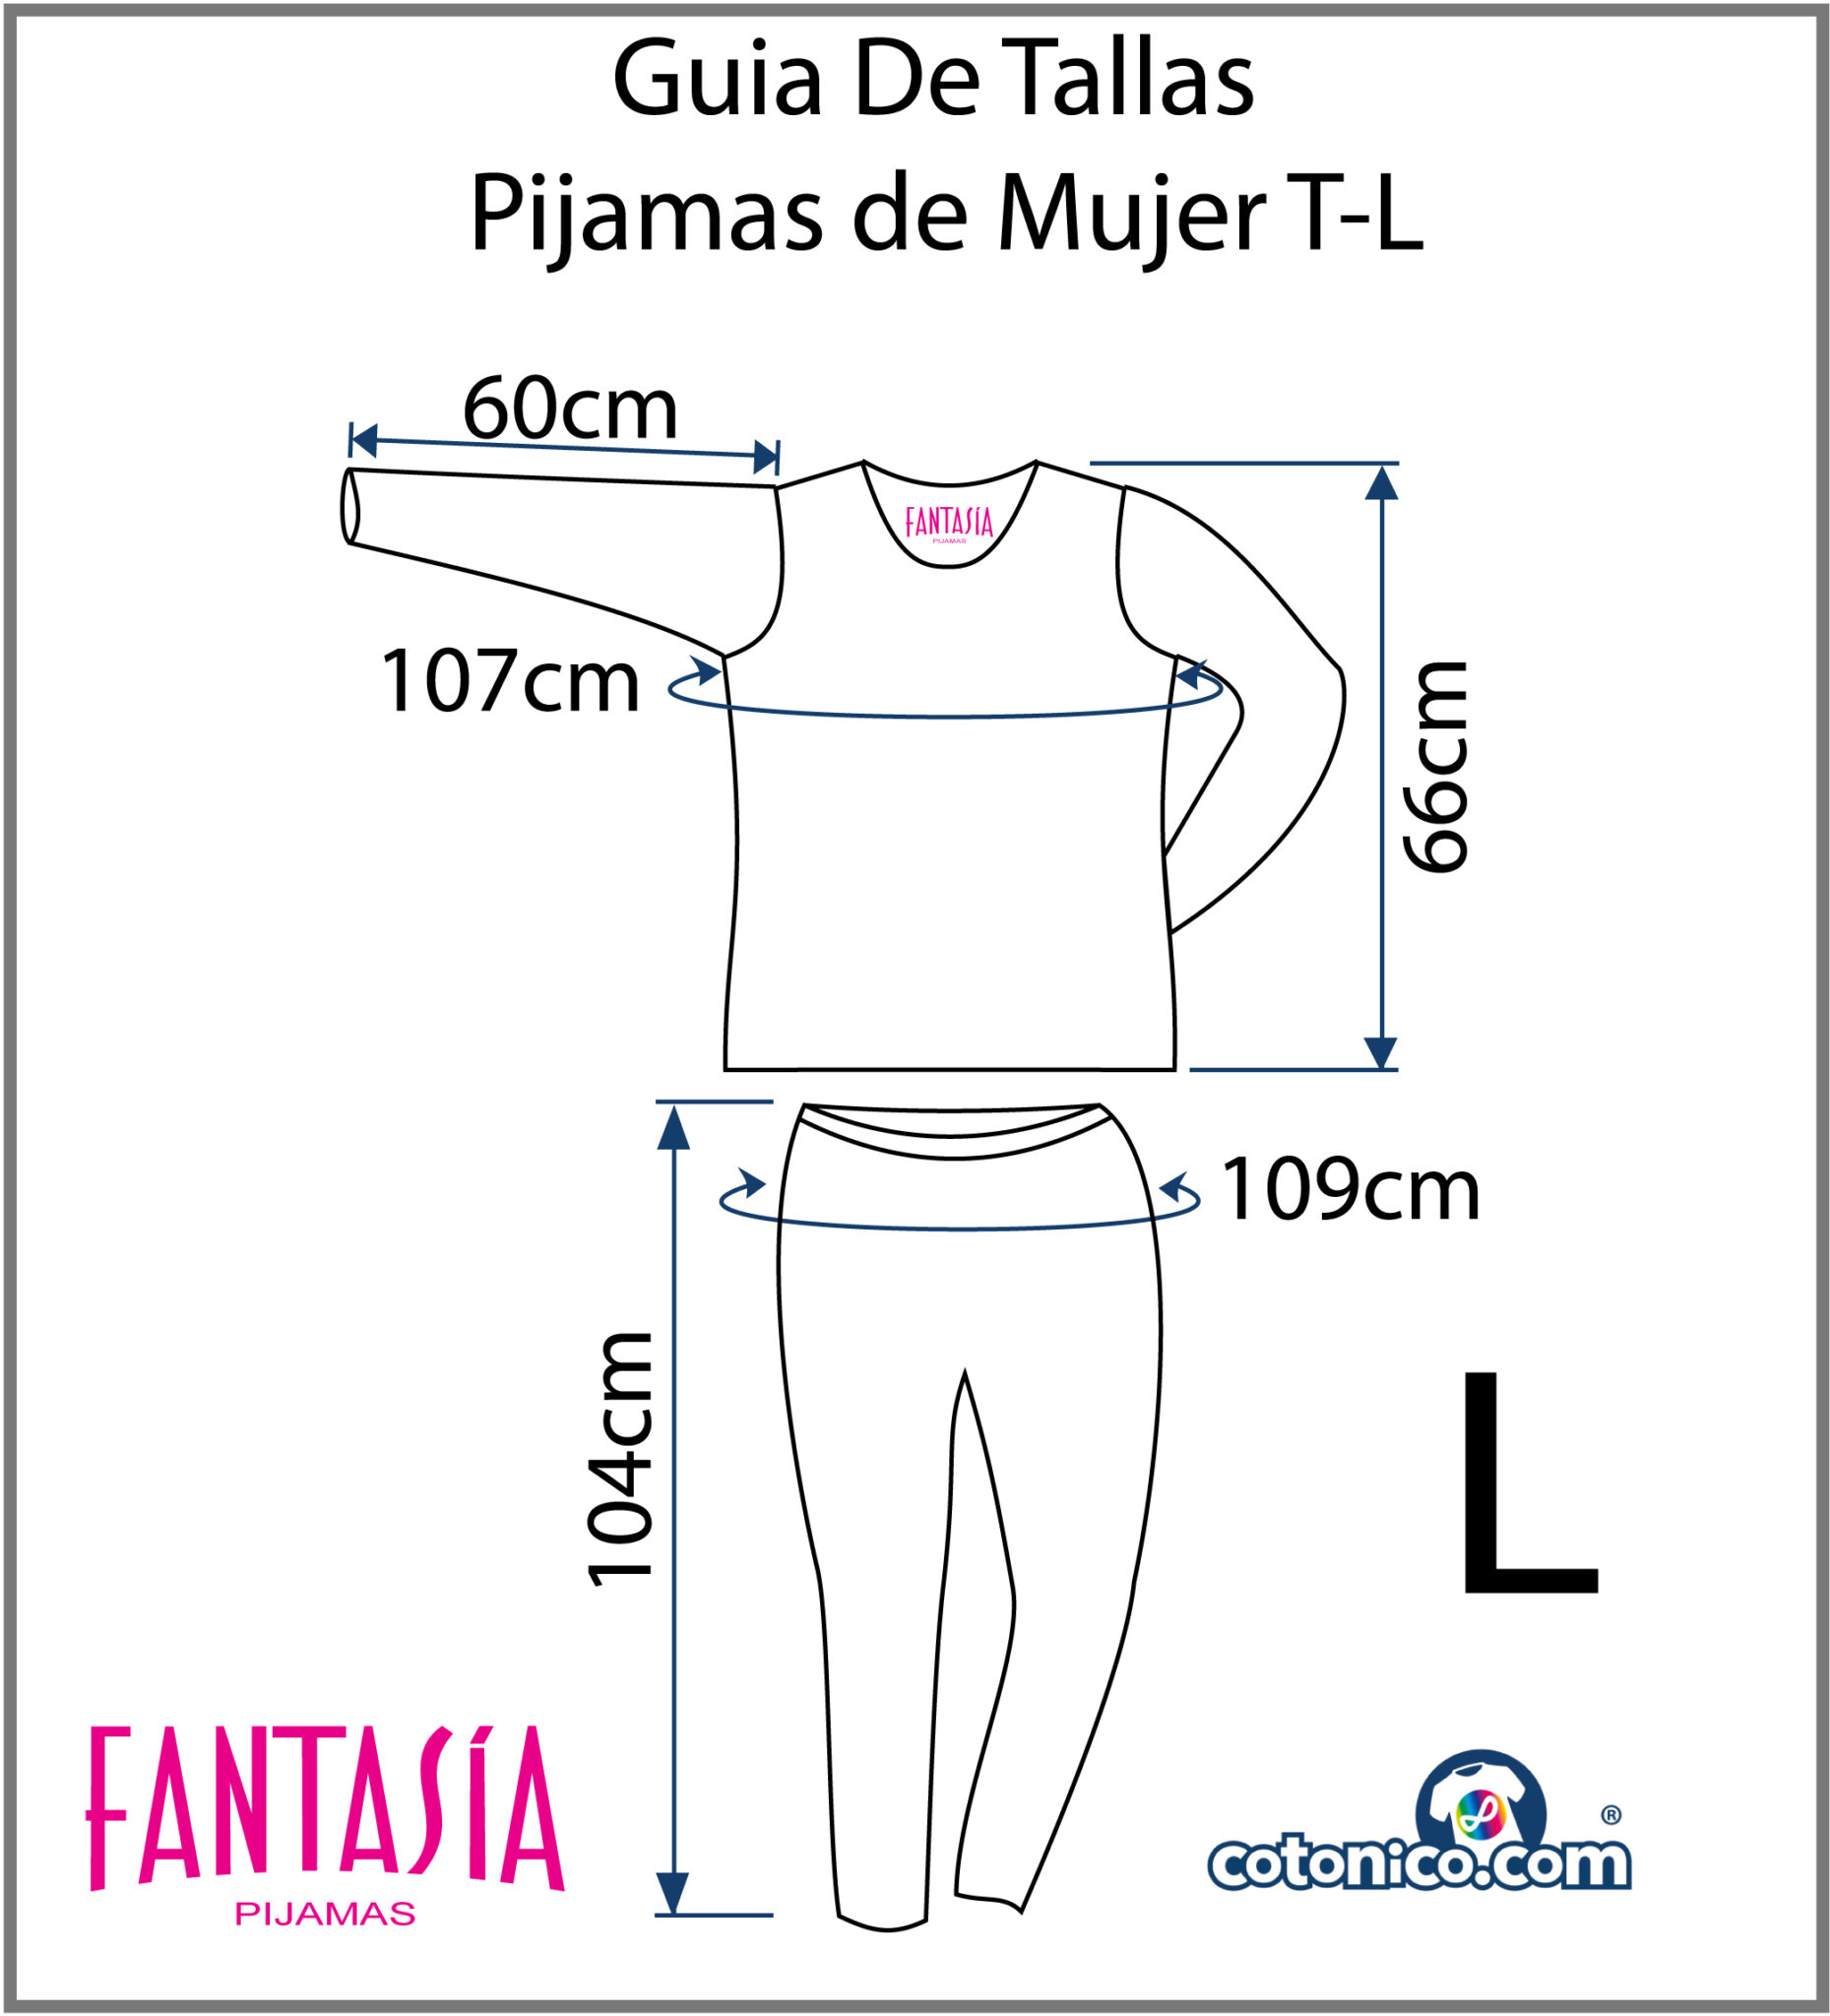 Guia-De-Tallas-Pijamas-De-Mujer-L